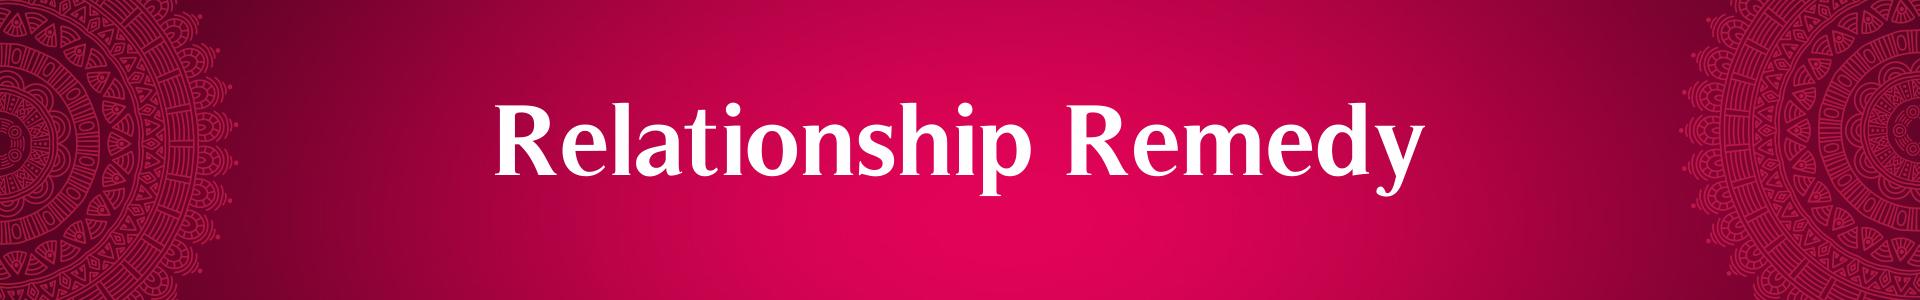 Relationship Remedies